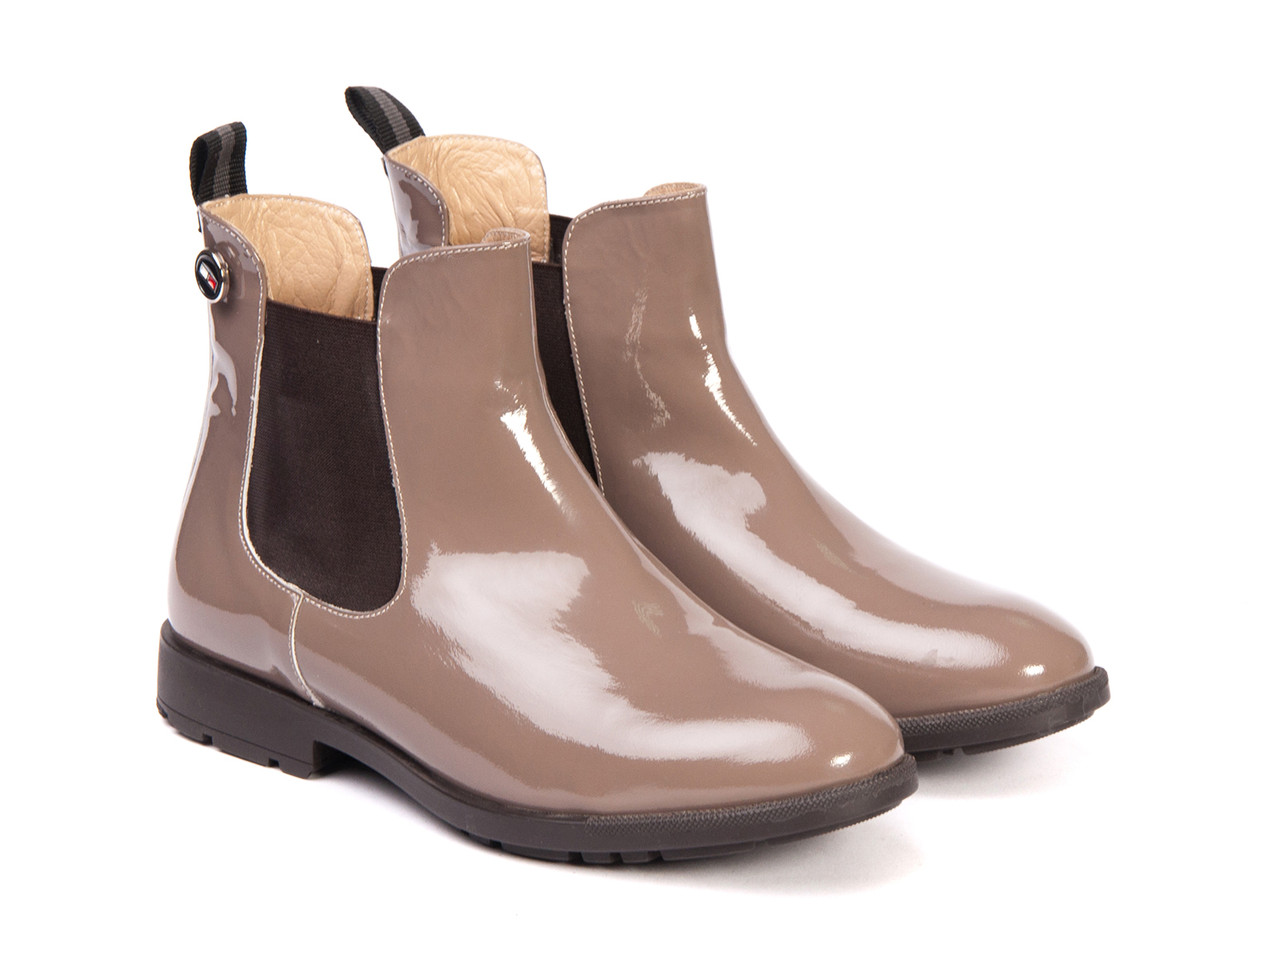 Ботинки Etor 4269-0-7134-1405 бежевые, фото 1